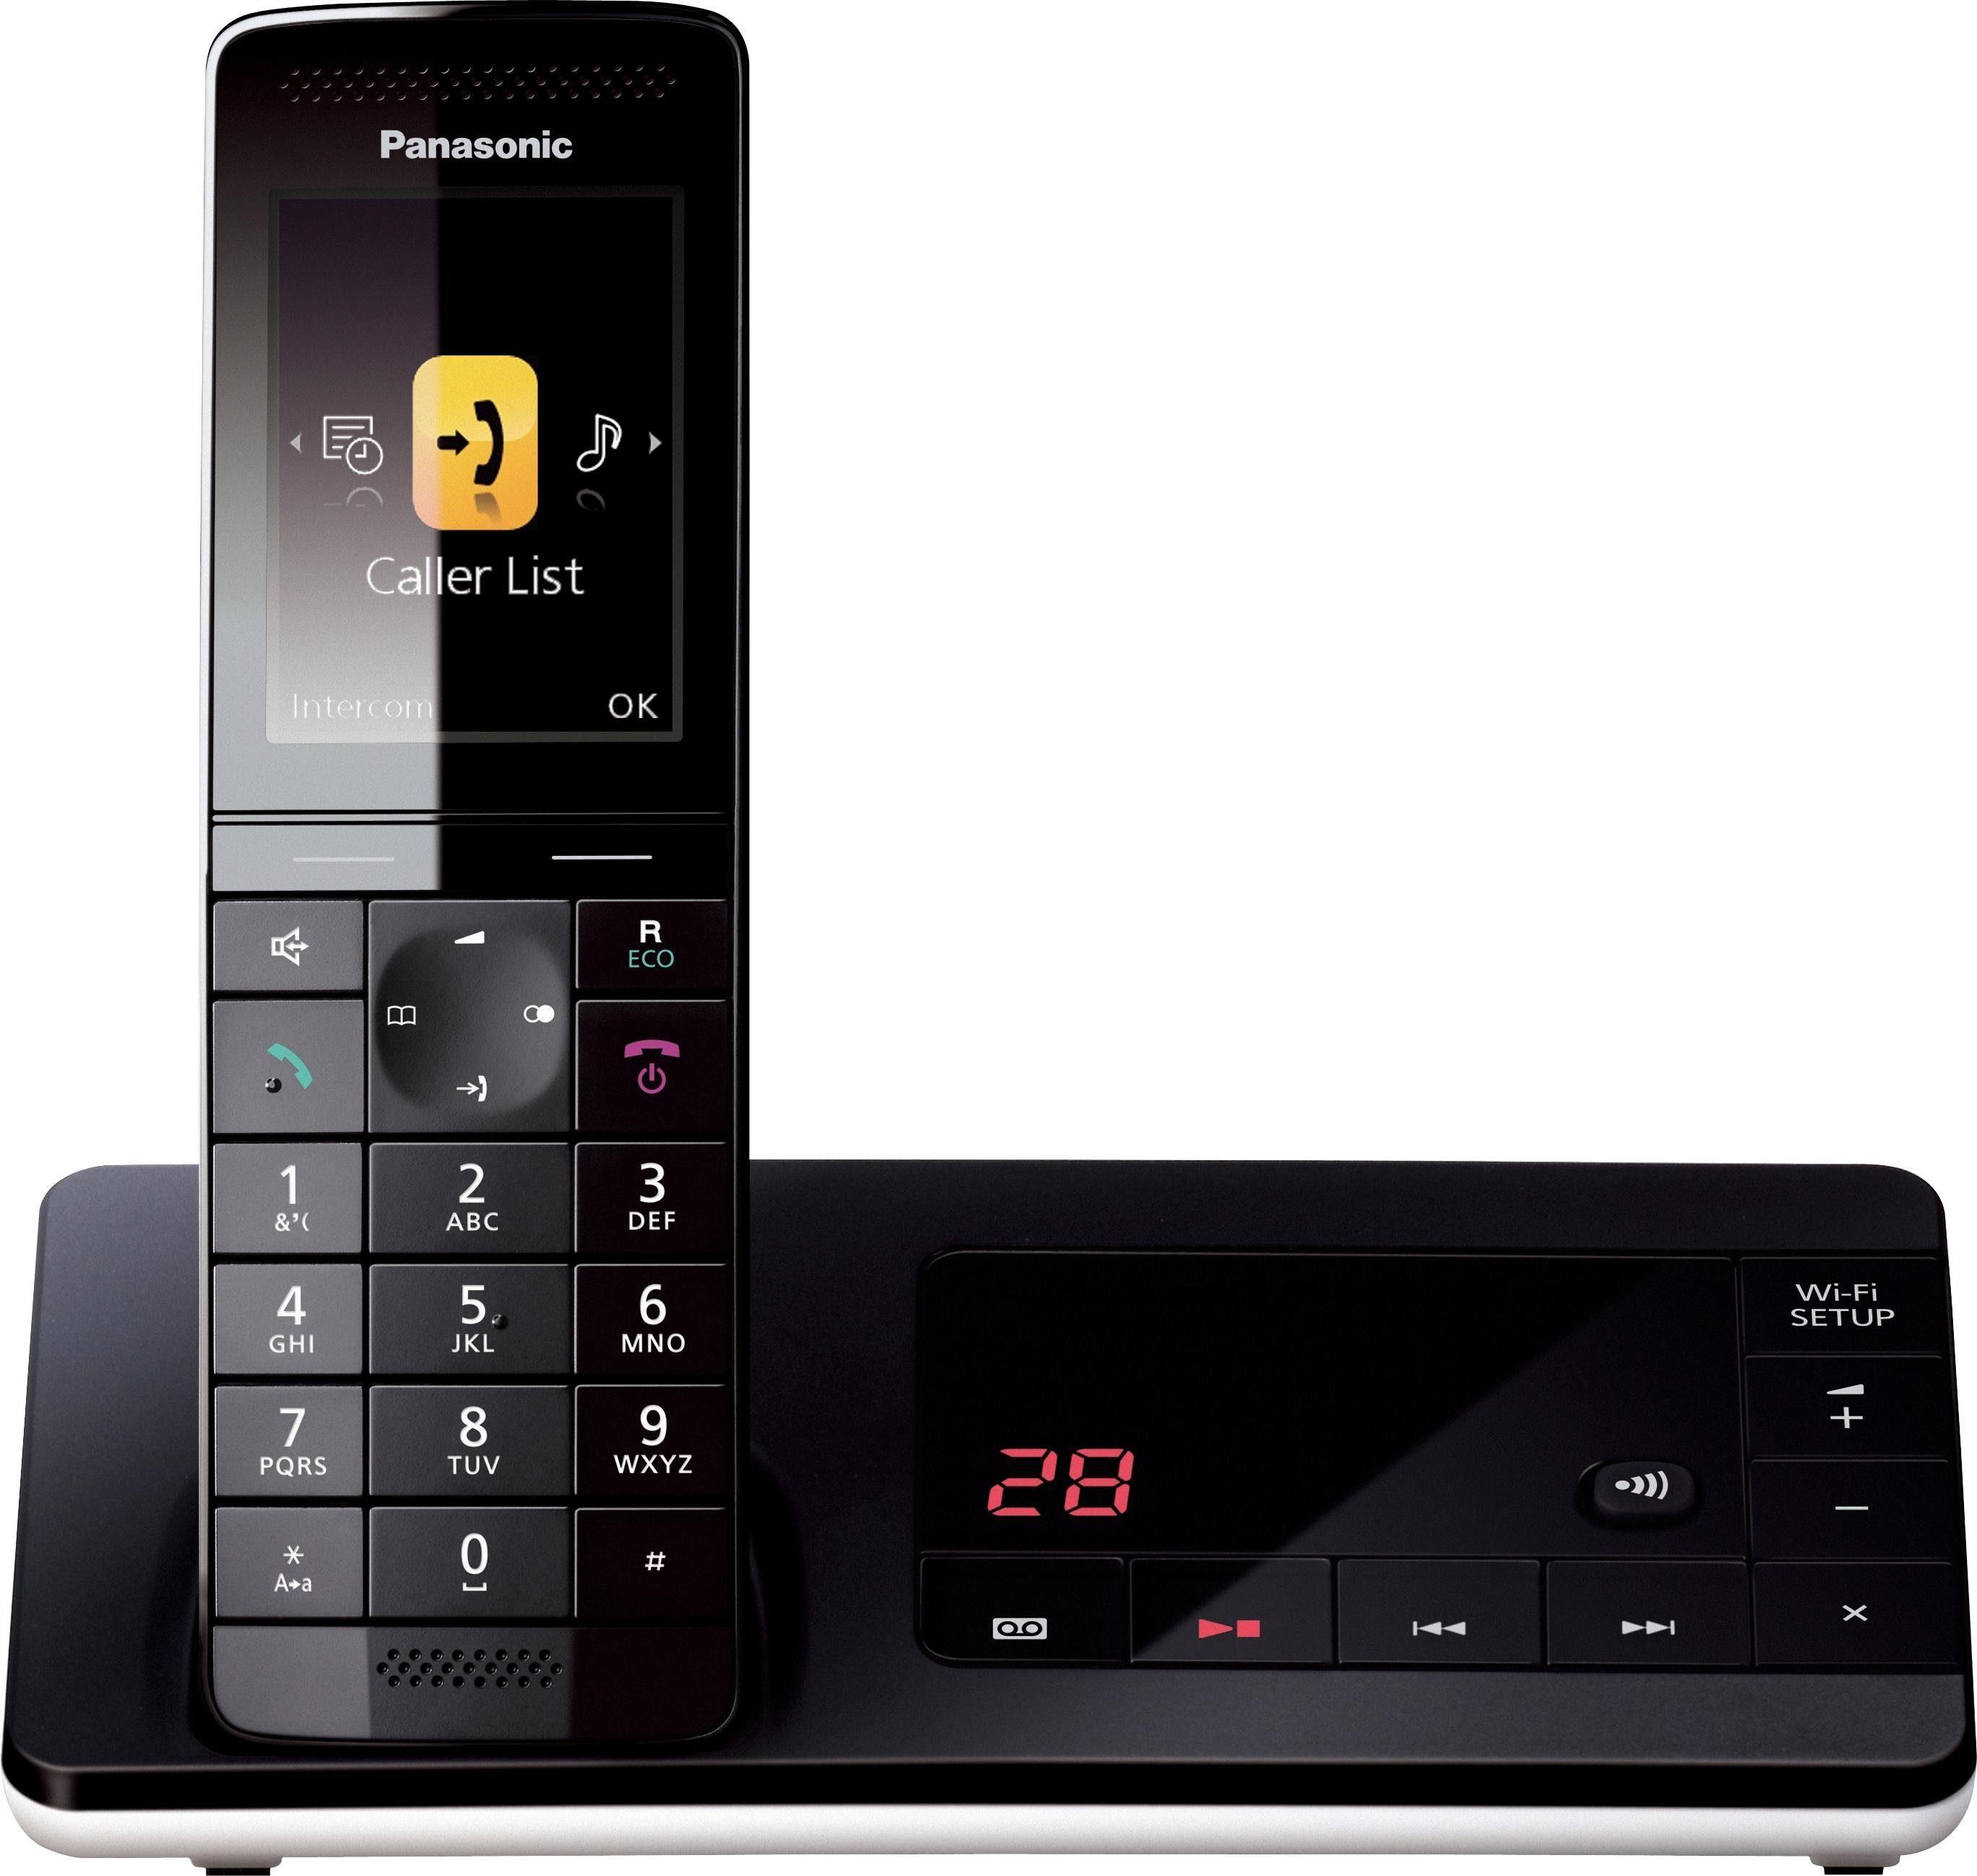 Panasonic »KX-PRW130« Schnurloses DECT-Telefon (WLAN (Wi-Fi)